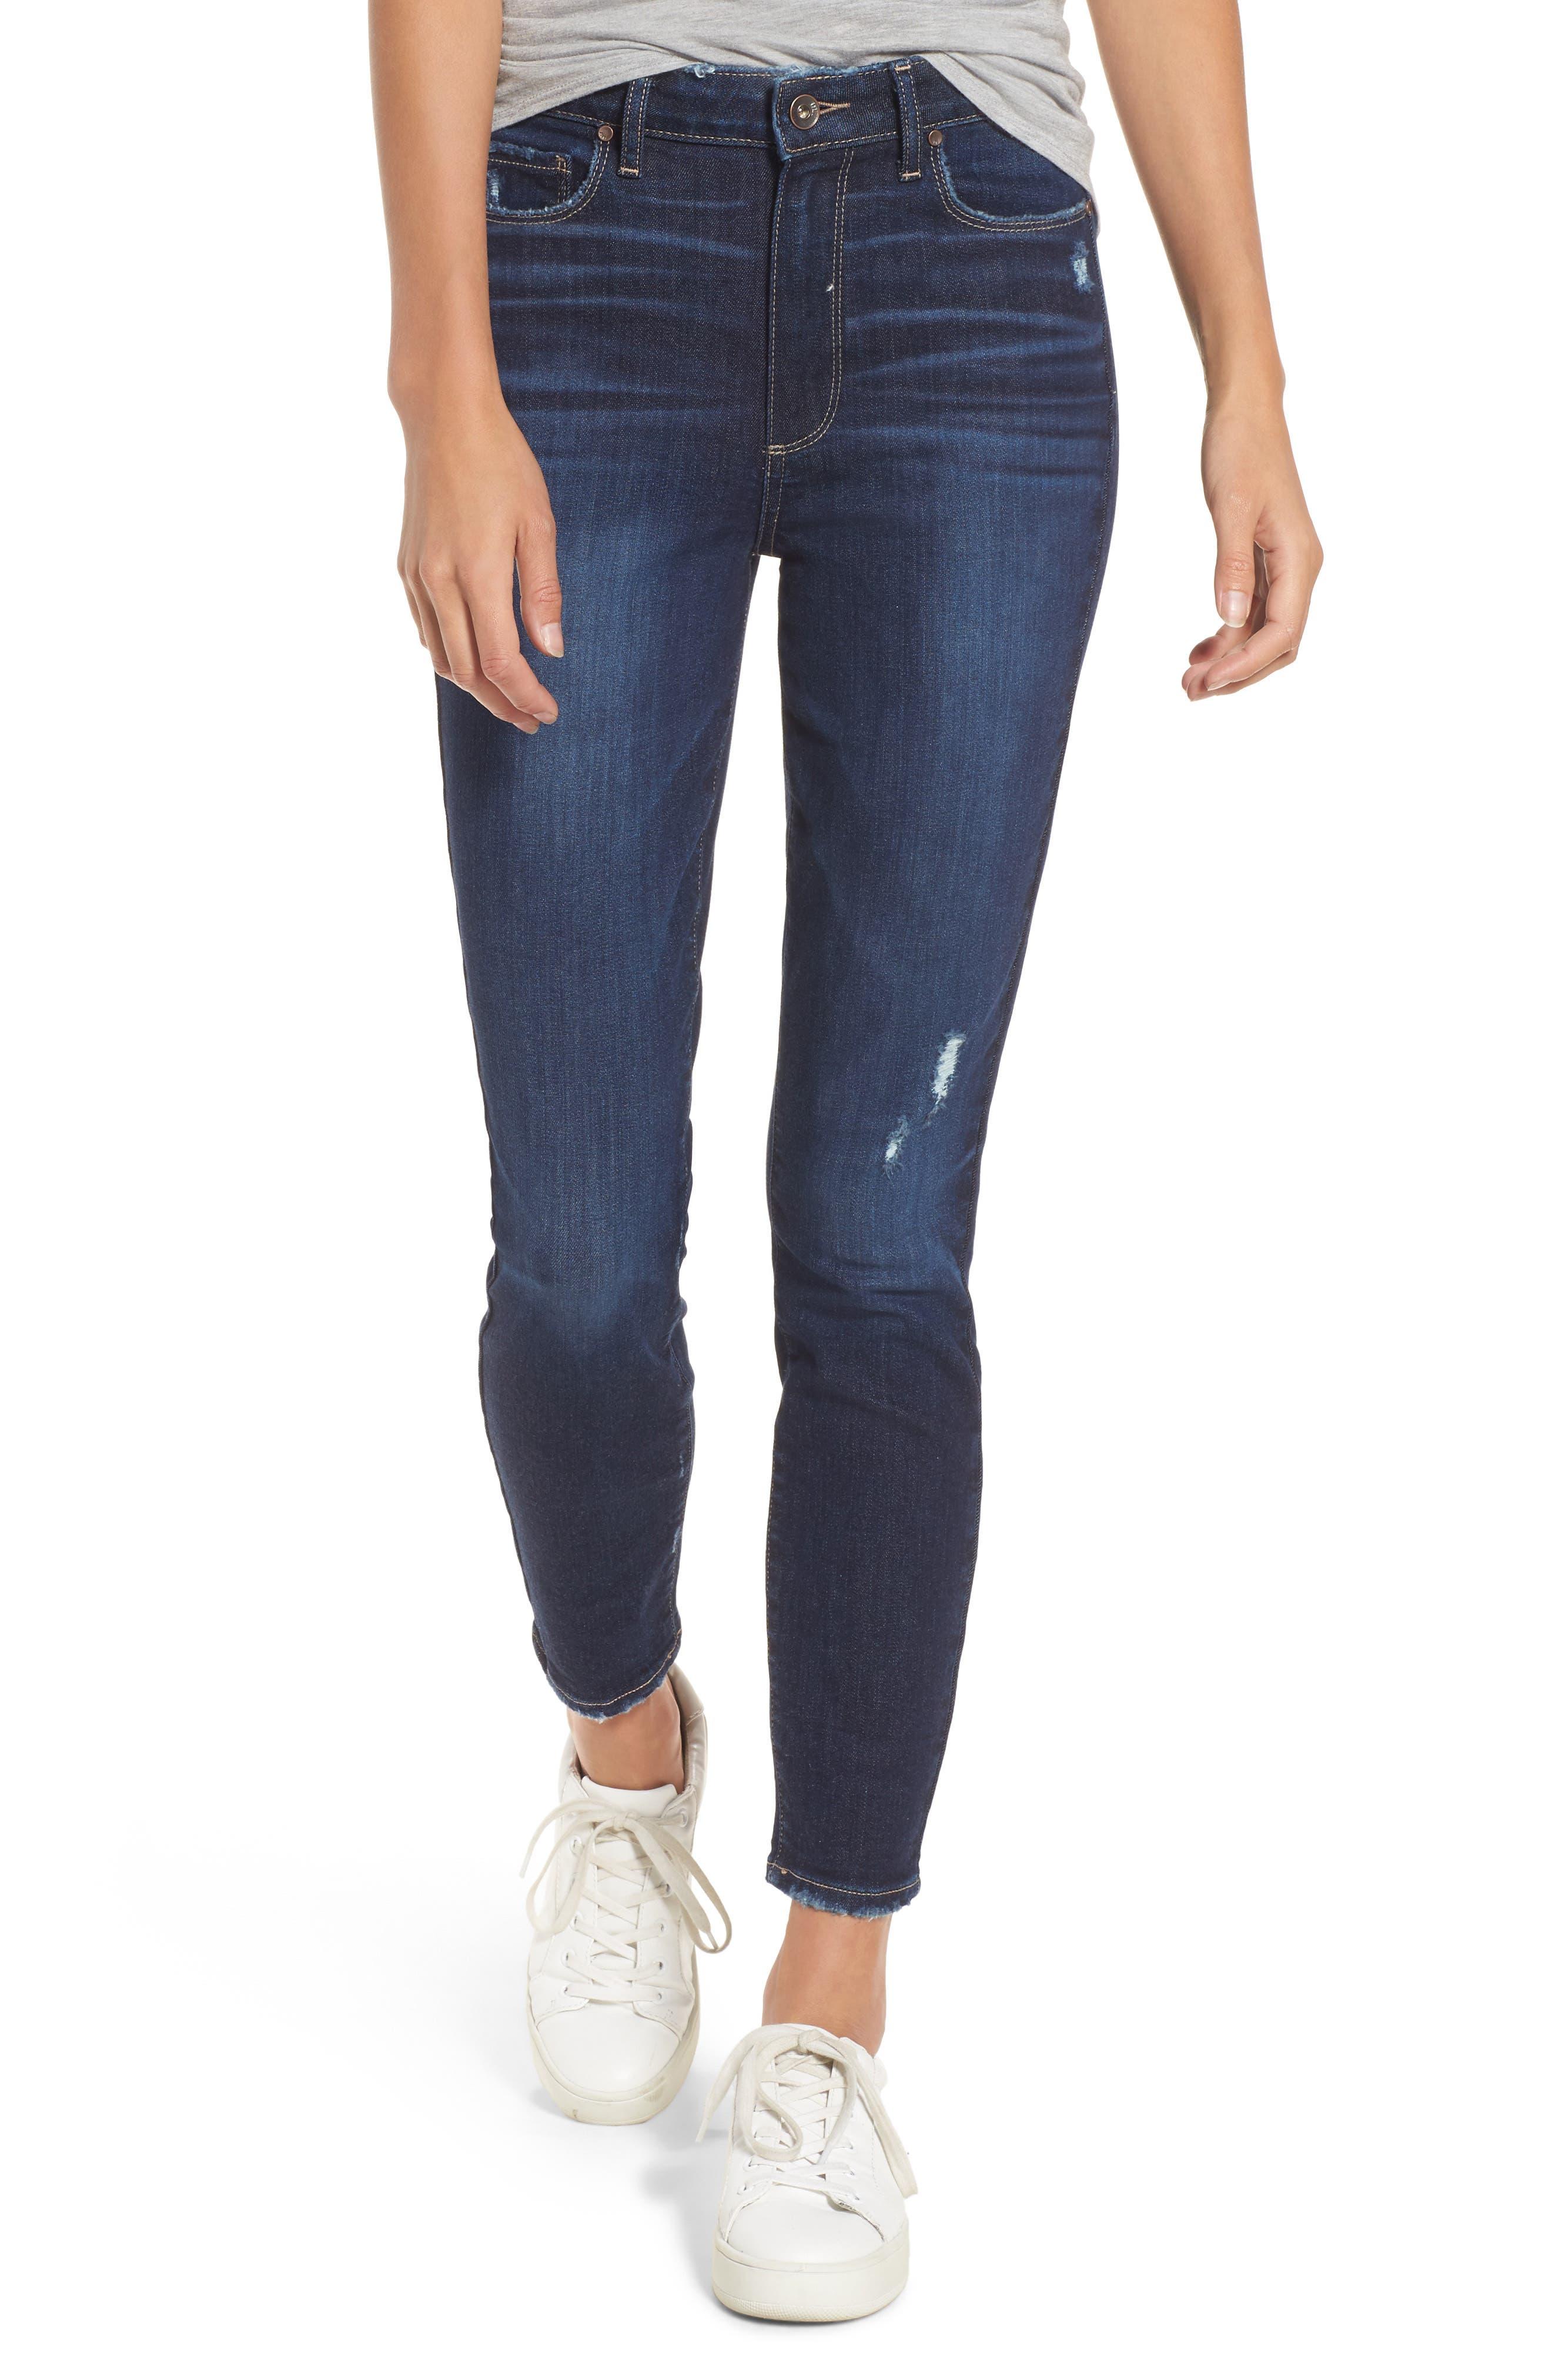 Main Image - PAIGE Margot High Waist Ankle Skinny Jeans (Davidson Destructed)